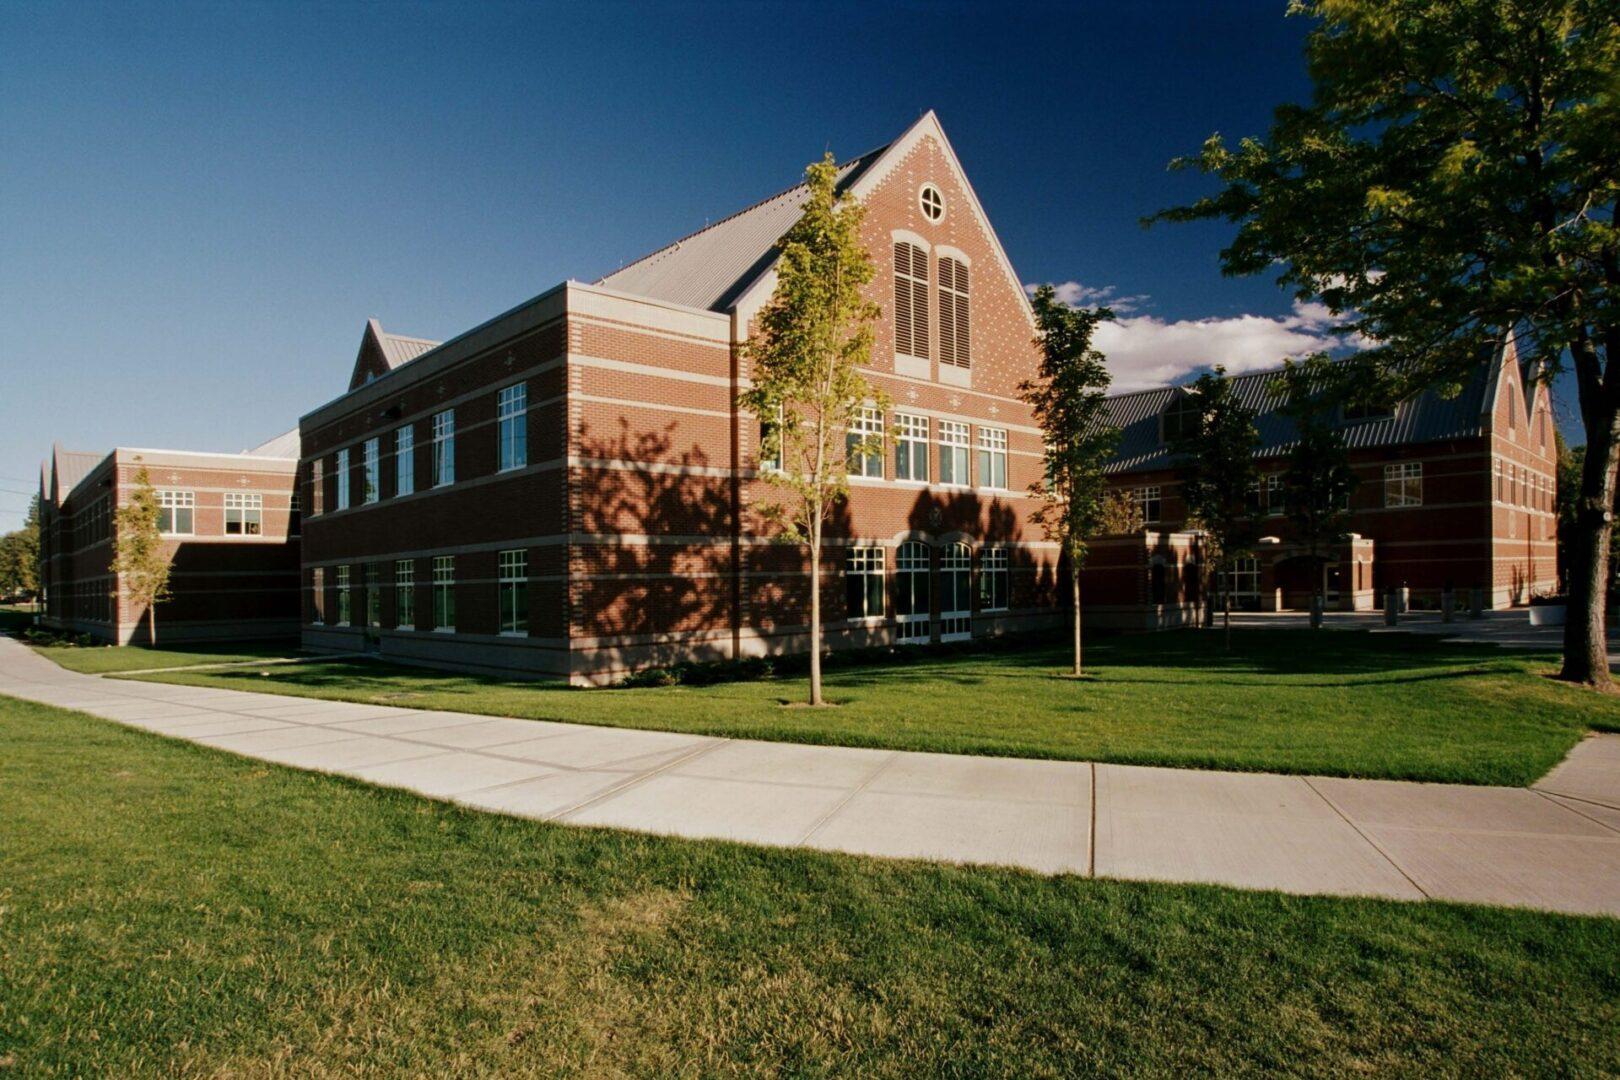 Black Hall at Central Washington University